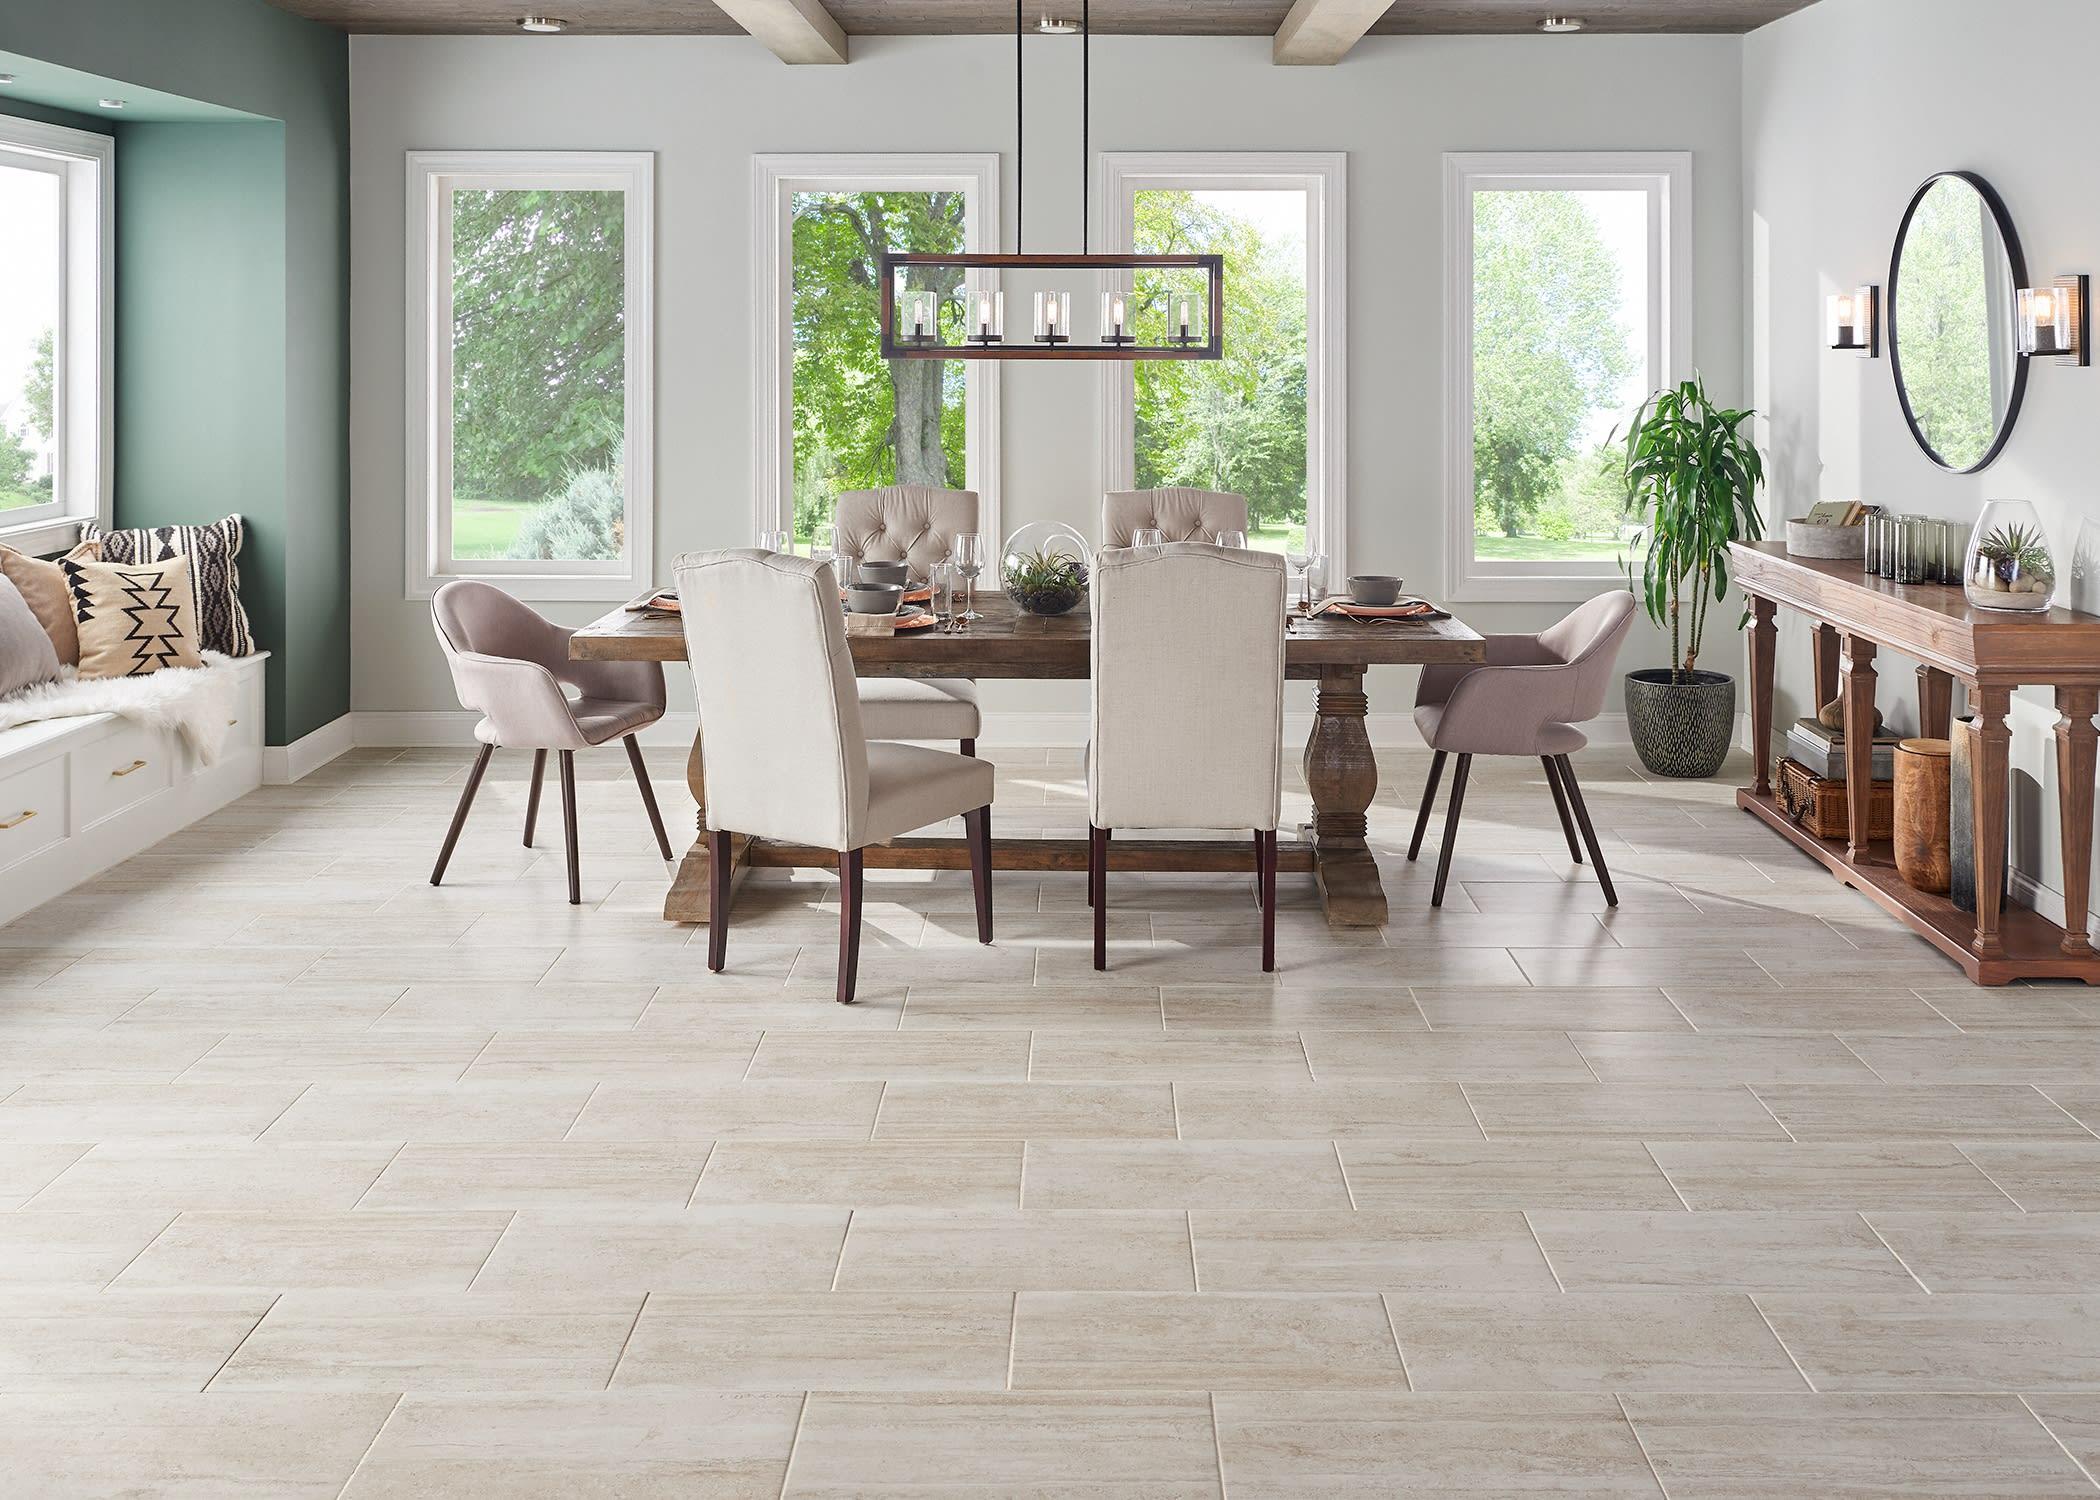 Avella Graystone Travertine Porcelain Tile